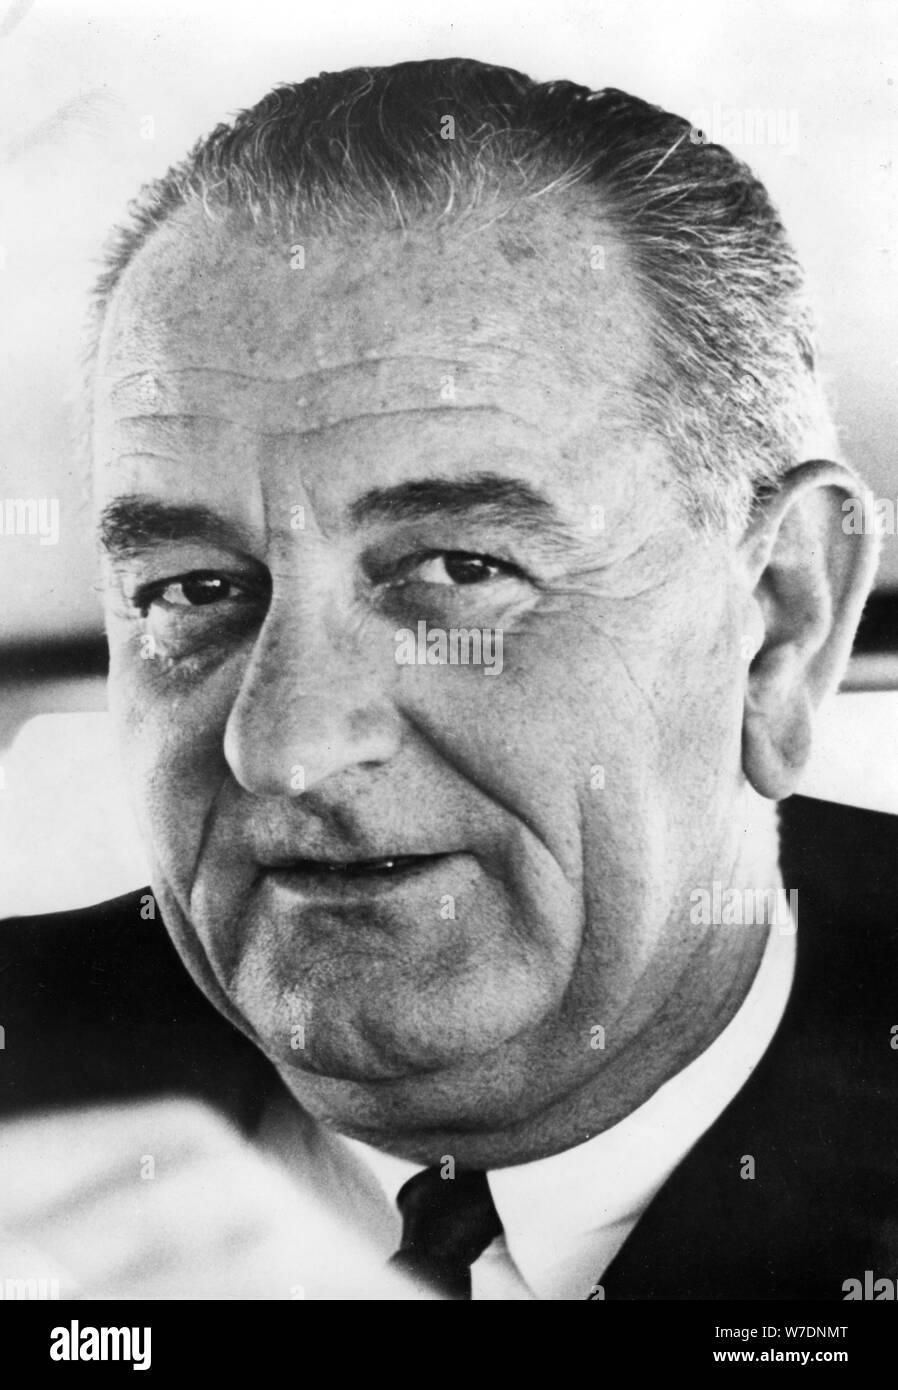 Lyndon B Johnson, 36th President of the United States, 1963-1969. Artist: Unknown Stock Photo